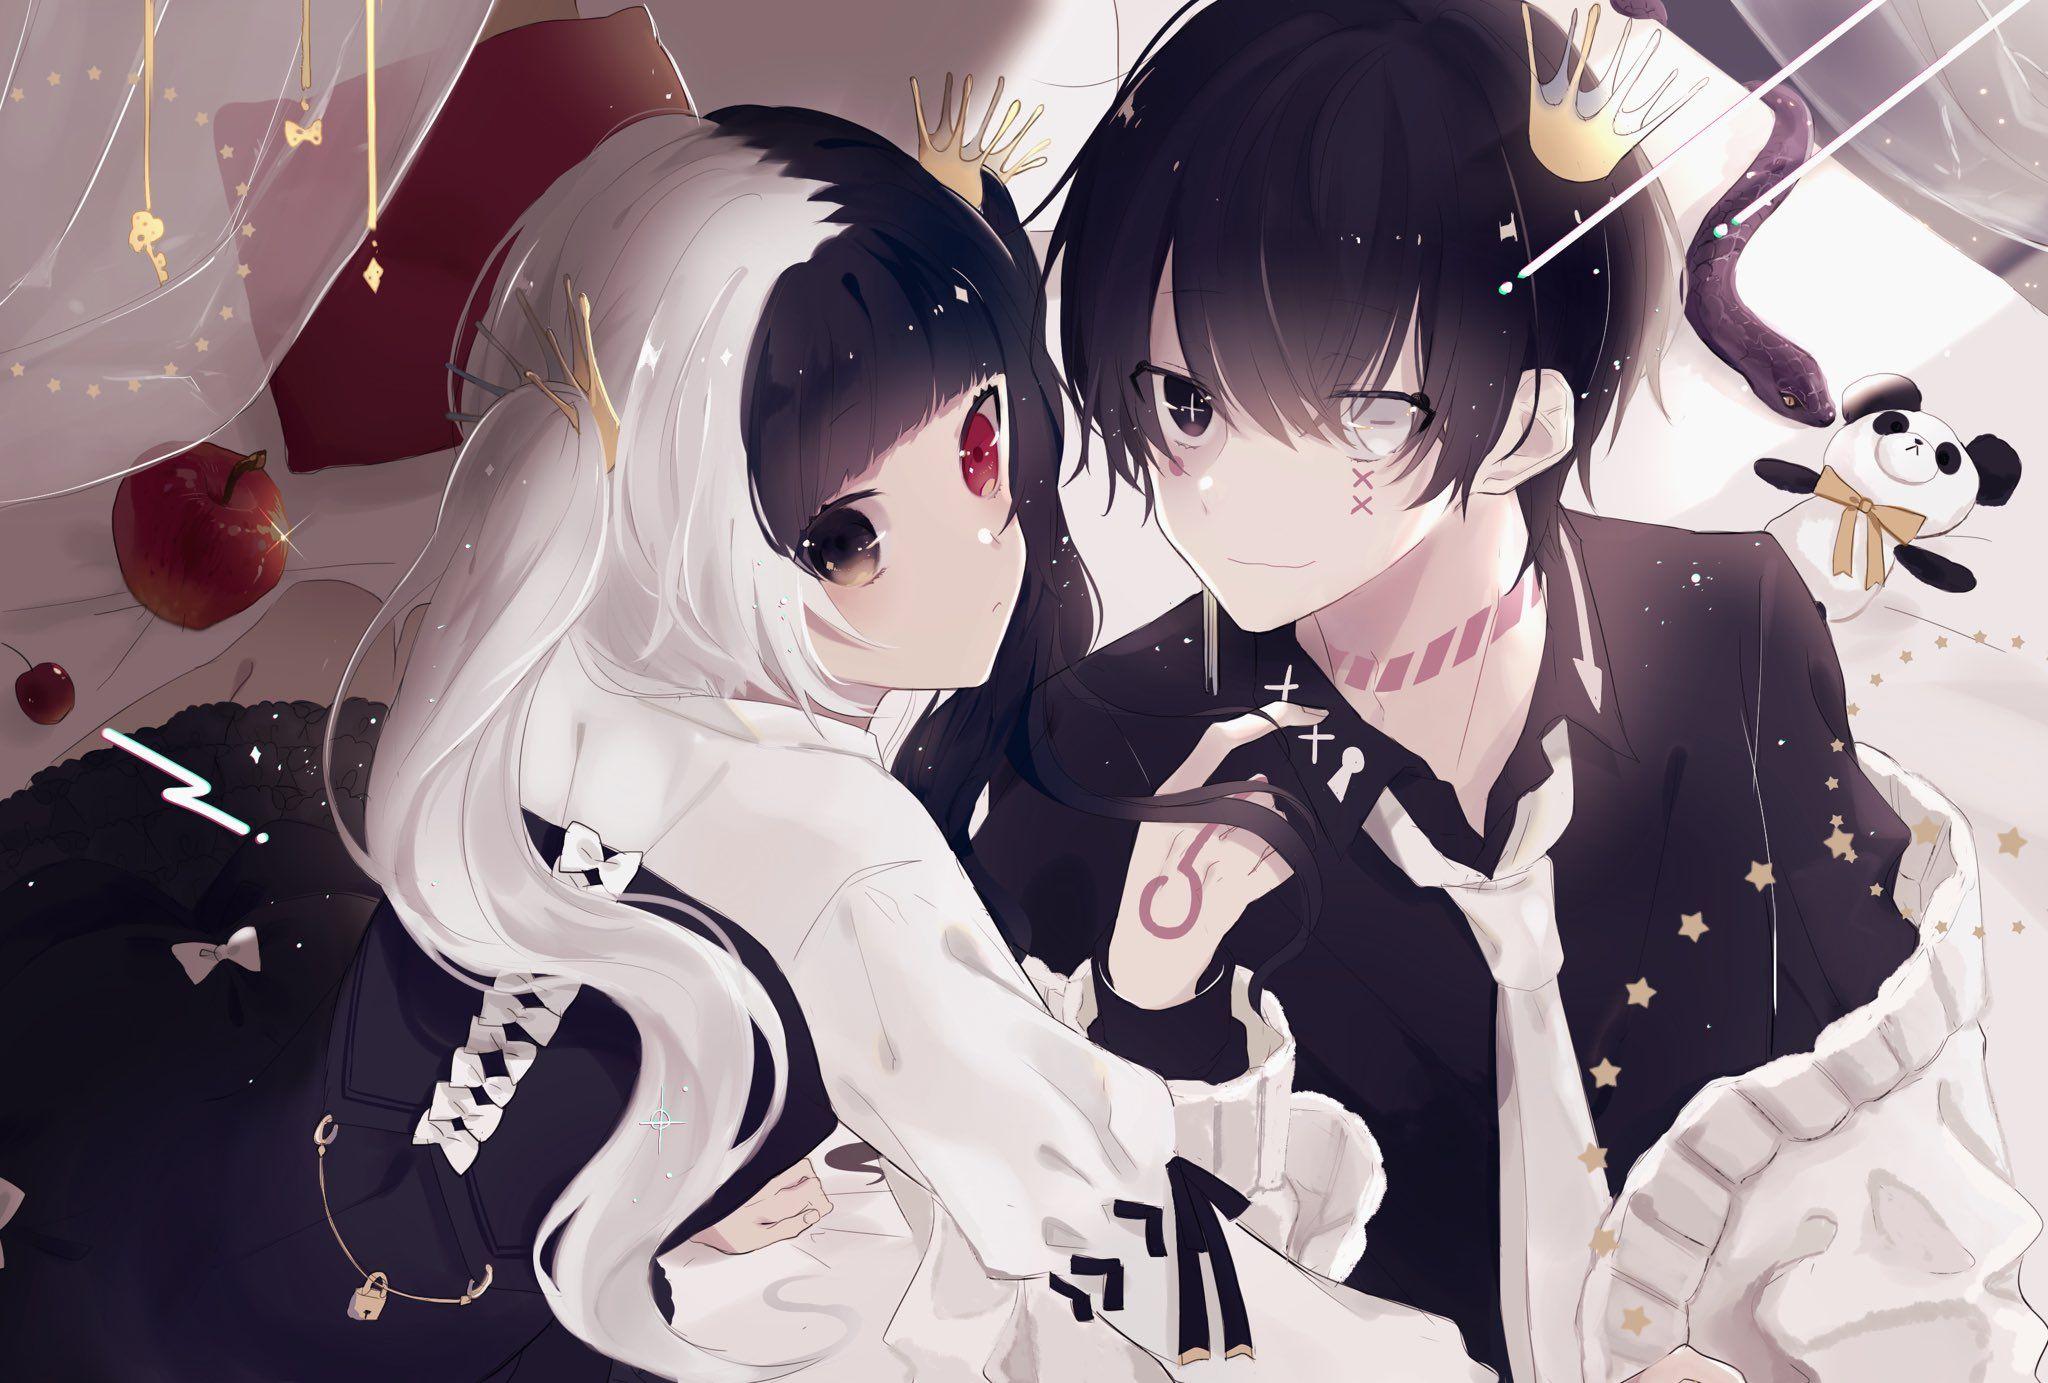 86 ゙ On Twitter Anime Eyes Anime Black Hair Anime Siblings